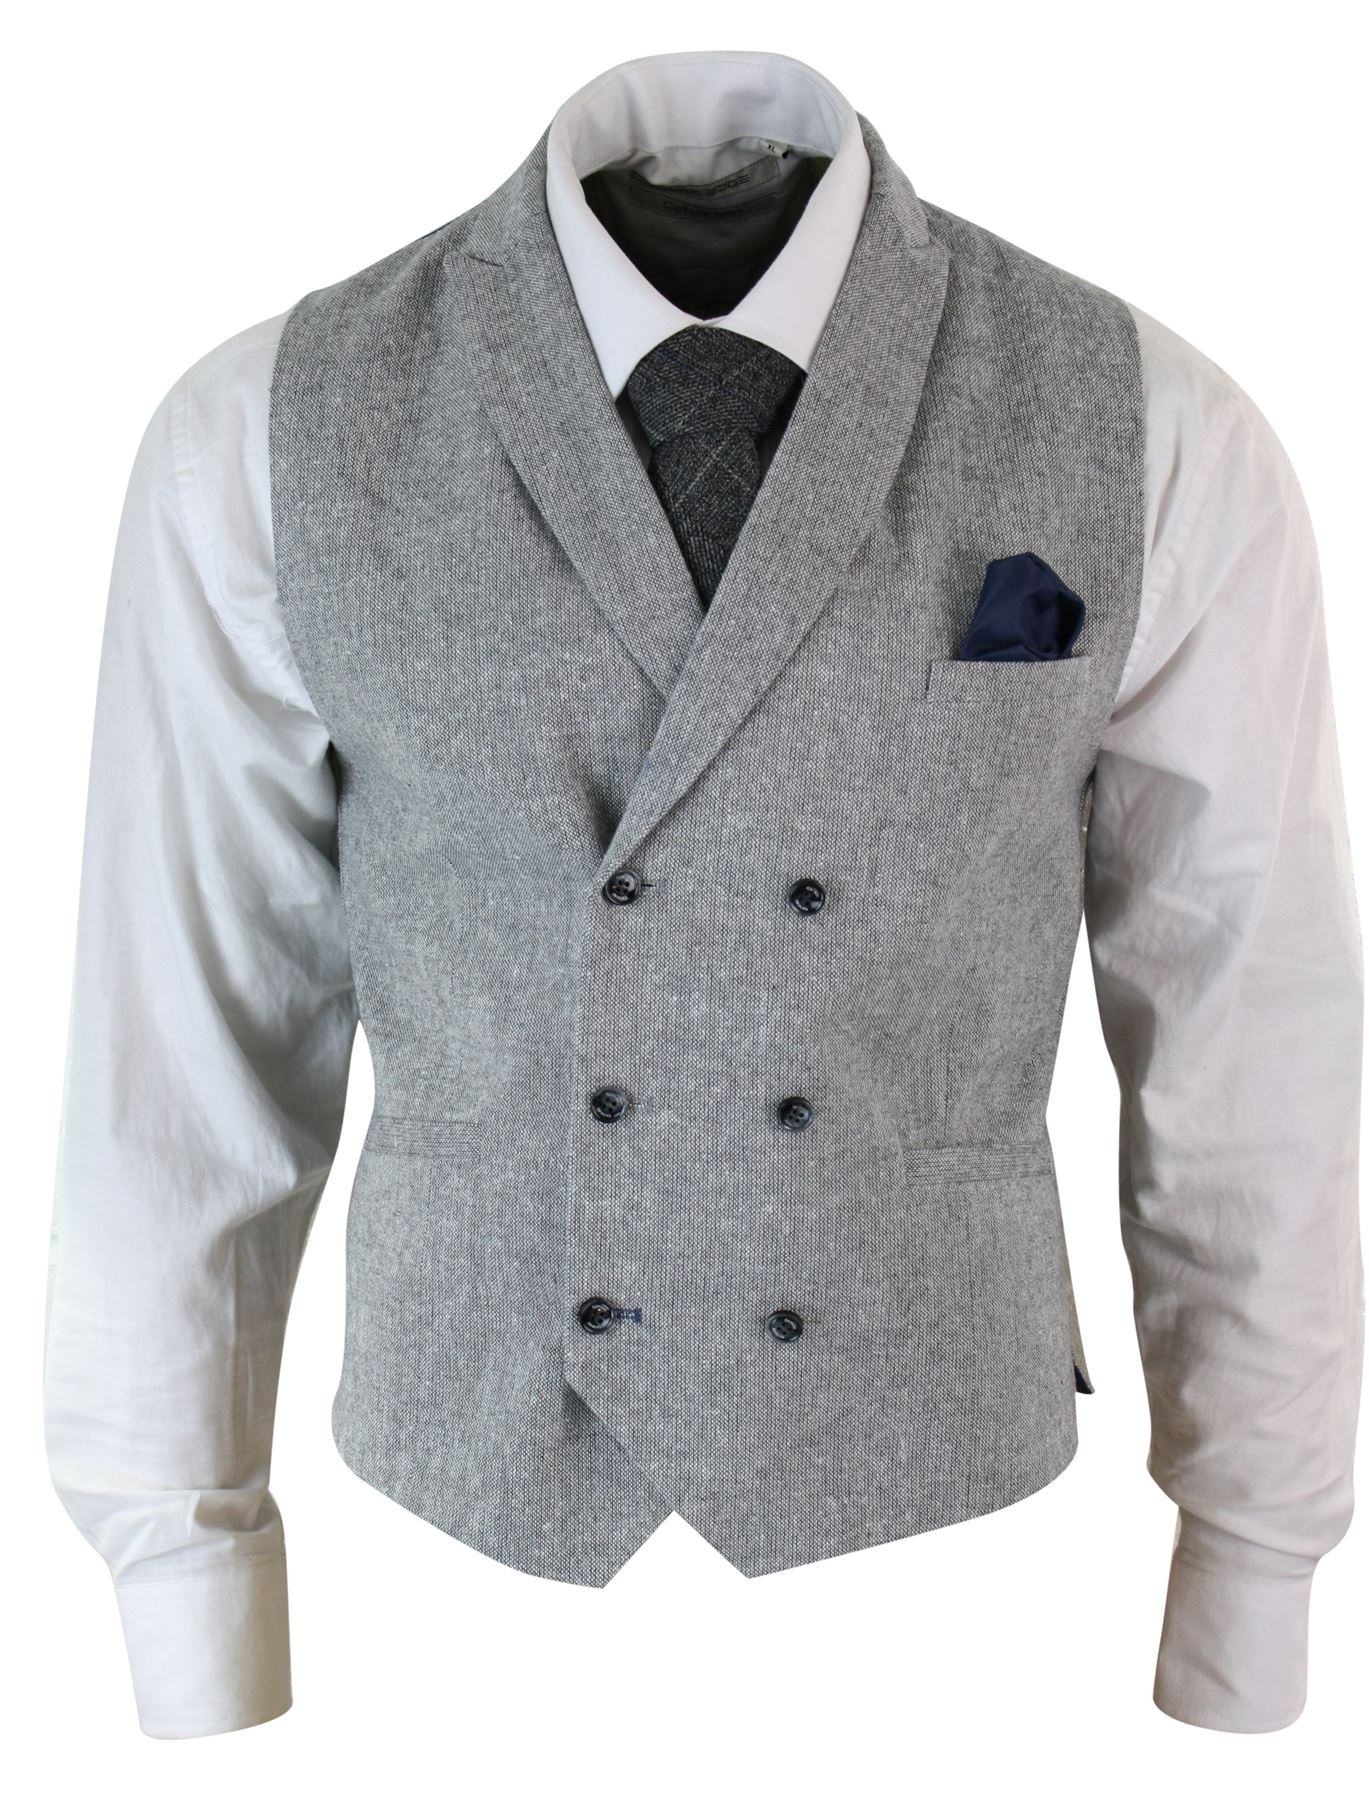 mens vintage peaky blinders double breasted waistcoat. Black Bedroom Furniture Sets. Home Design Ideas